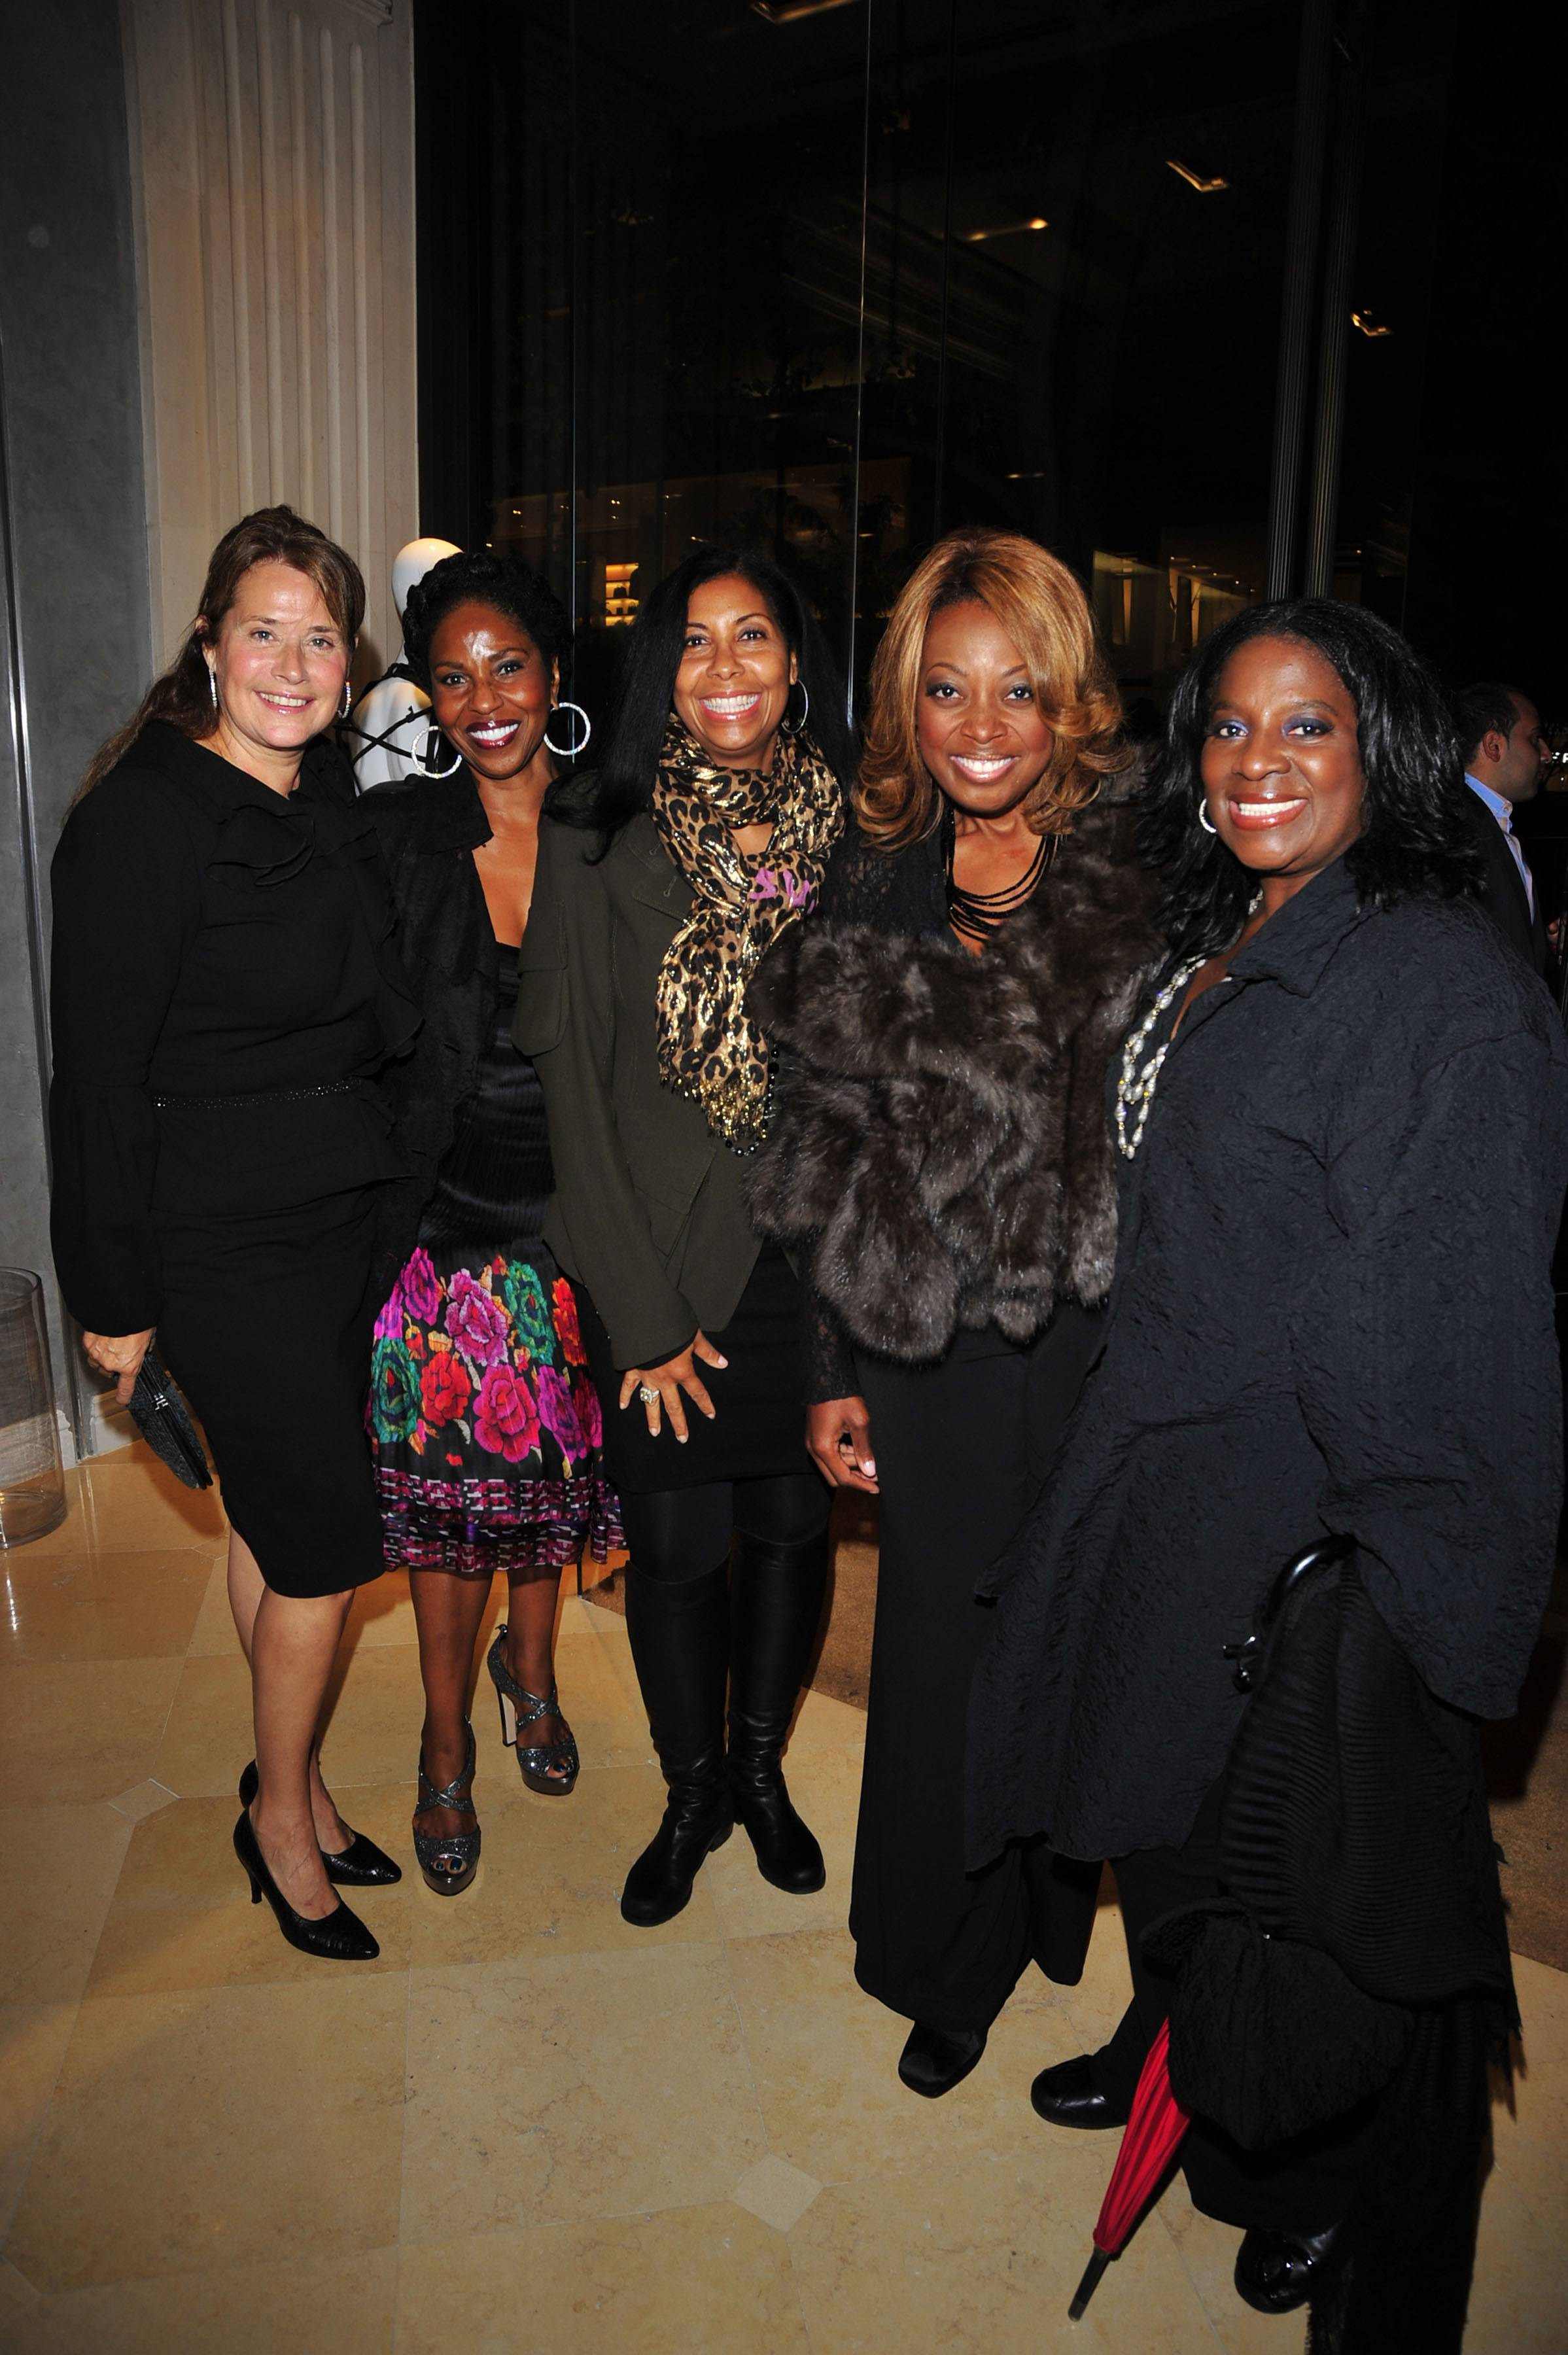 Lorraine Bracco, Paulette Washington, Cookie Johnson, Star Jones, Latanya Jackson